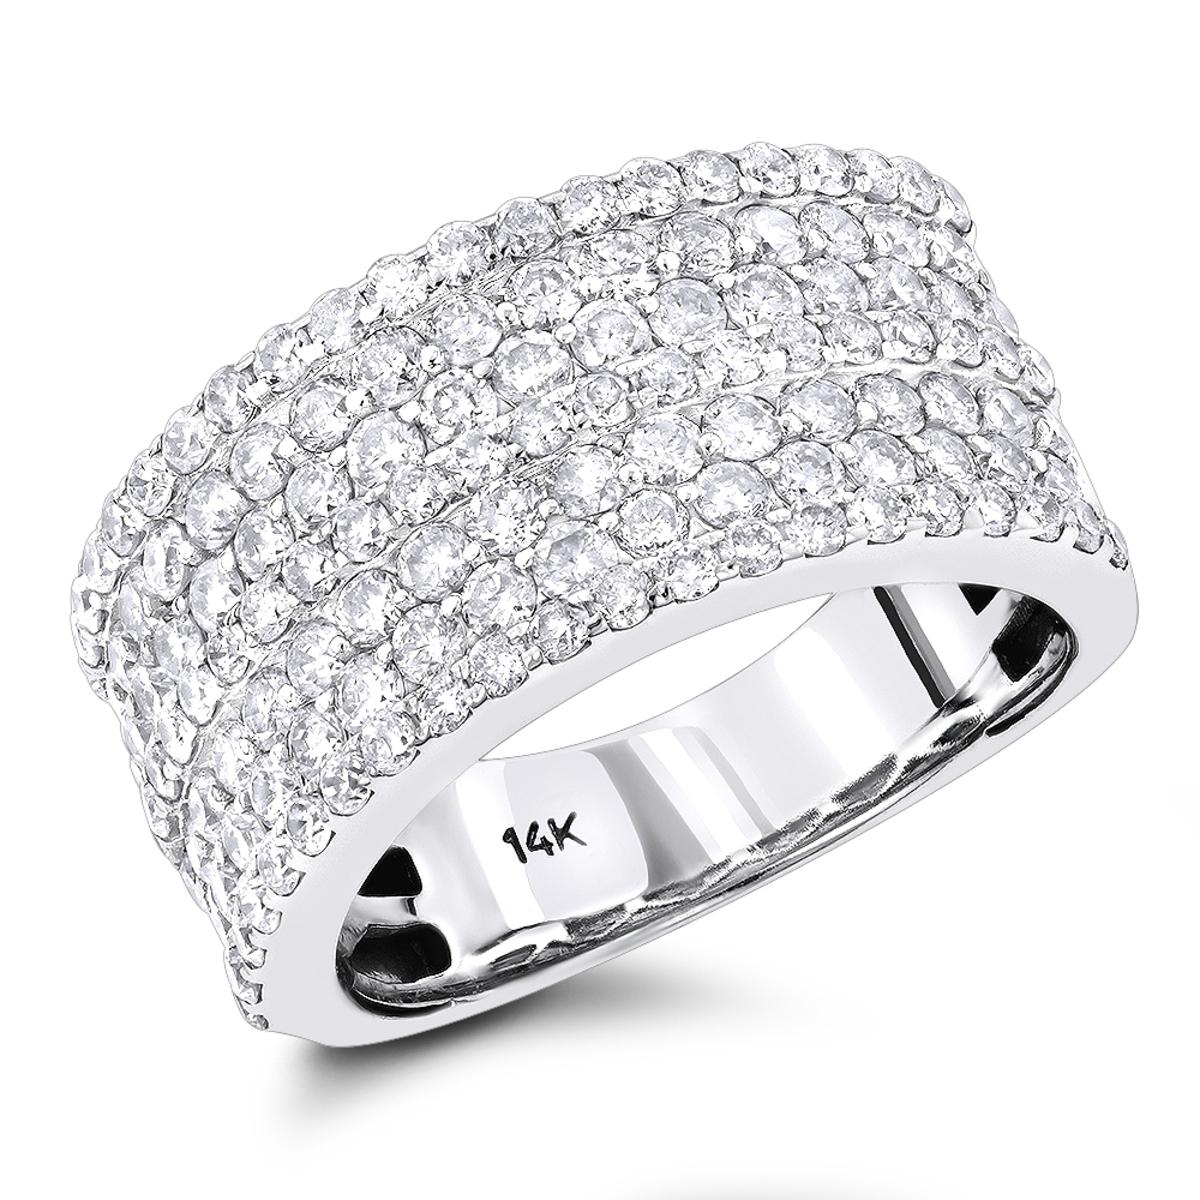 14K Gold 7 Row Ladies Diamond Ring 2ct Band